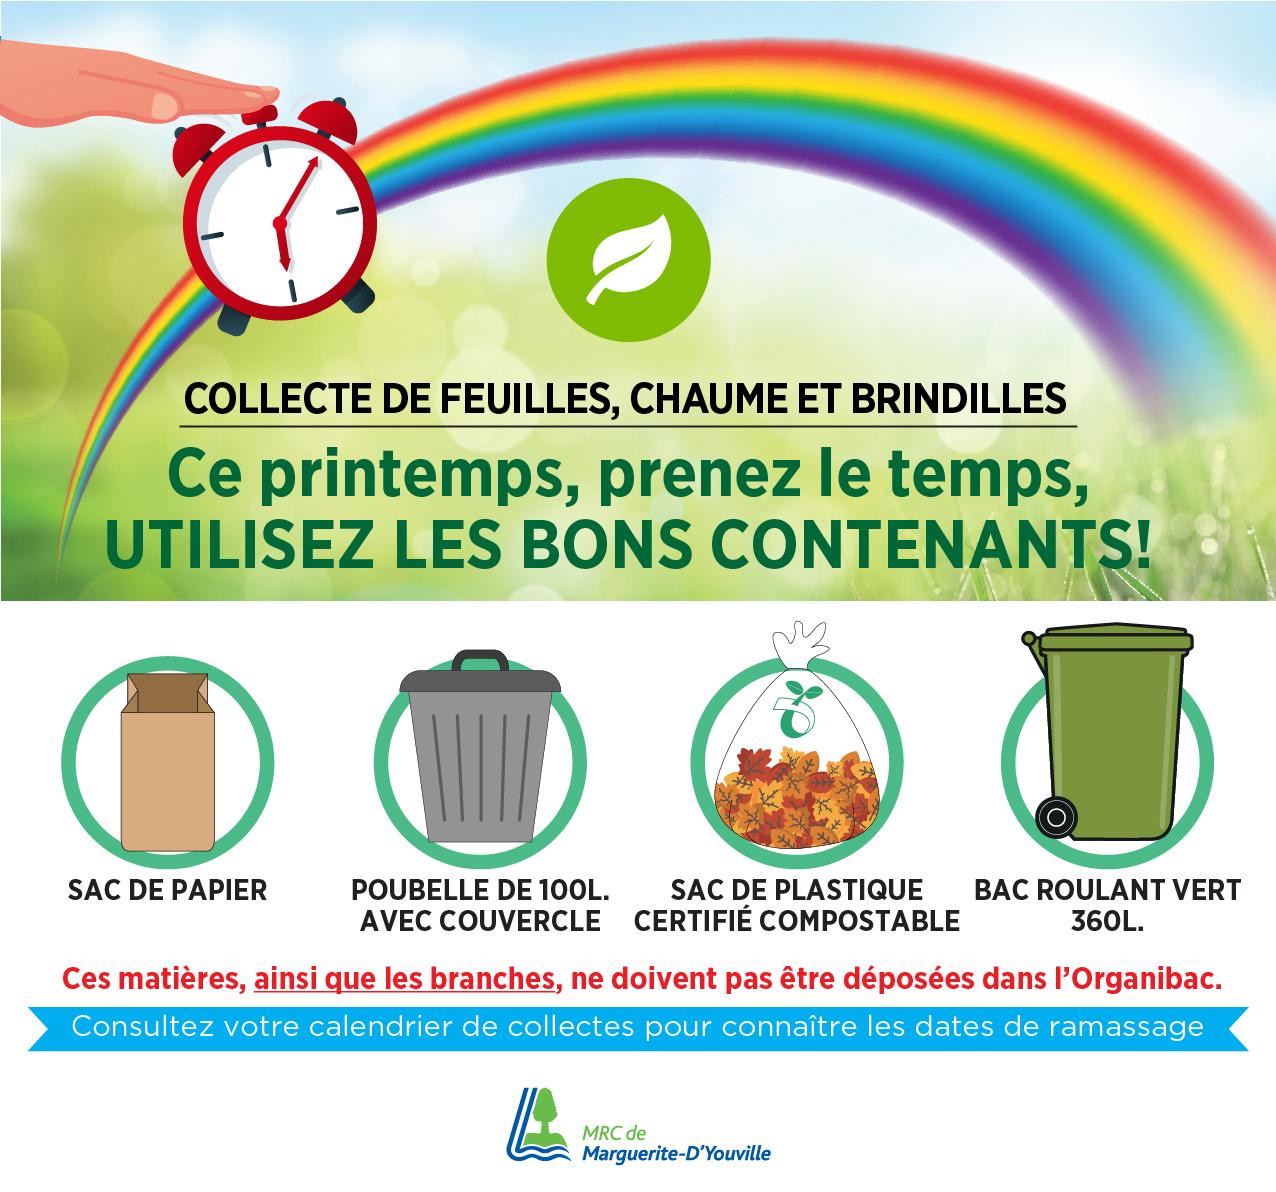 Feuilles2020_Collectes_Mai2020-01.jpg (845 KB)